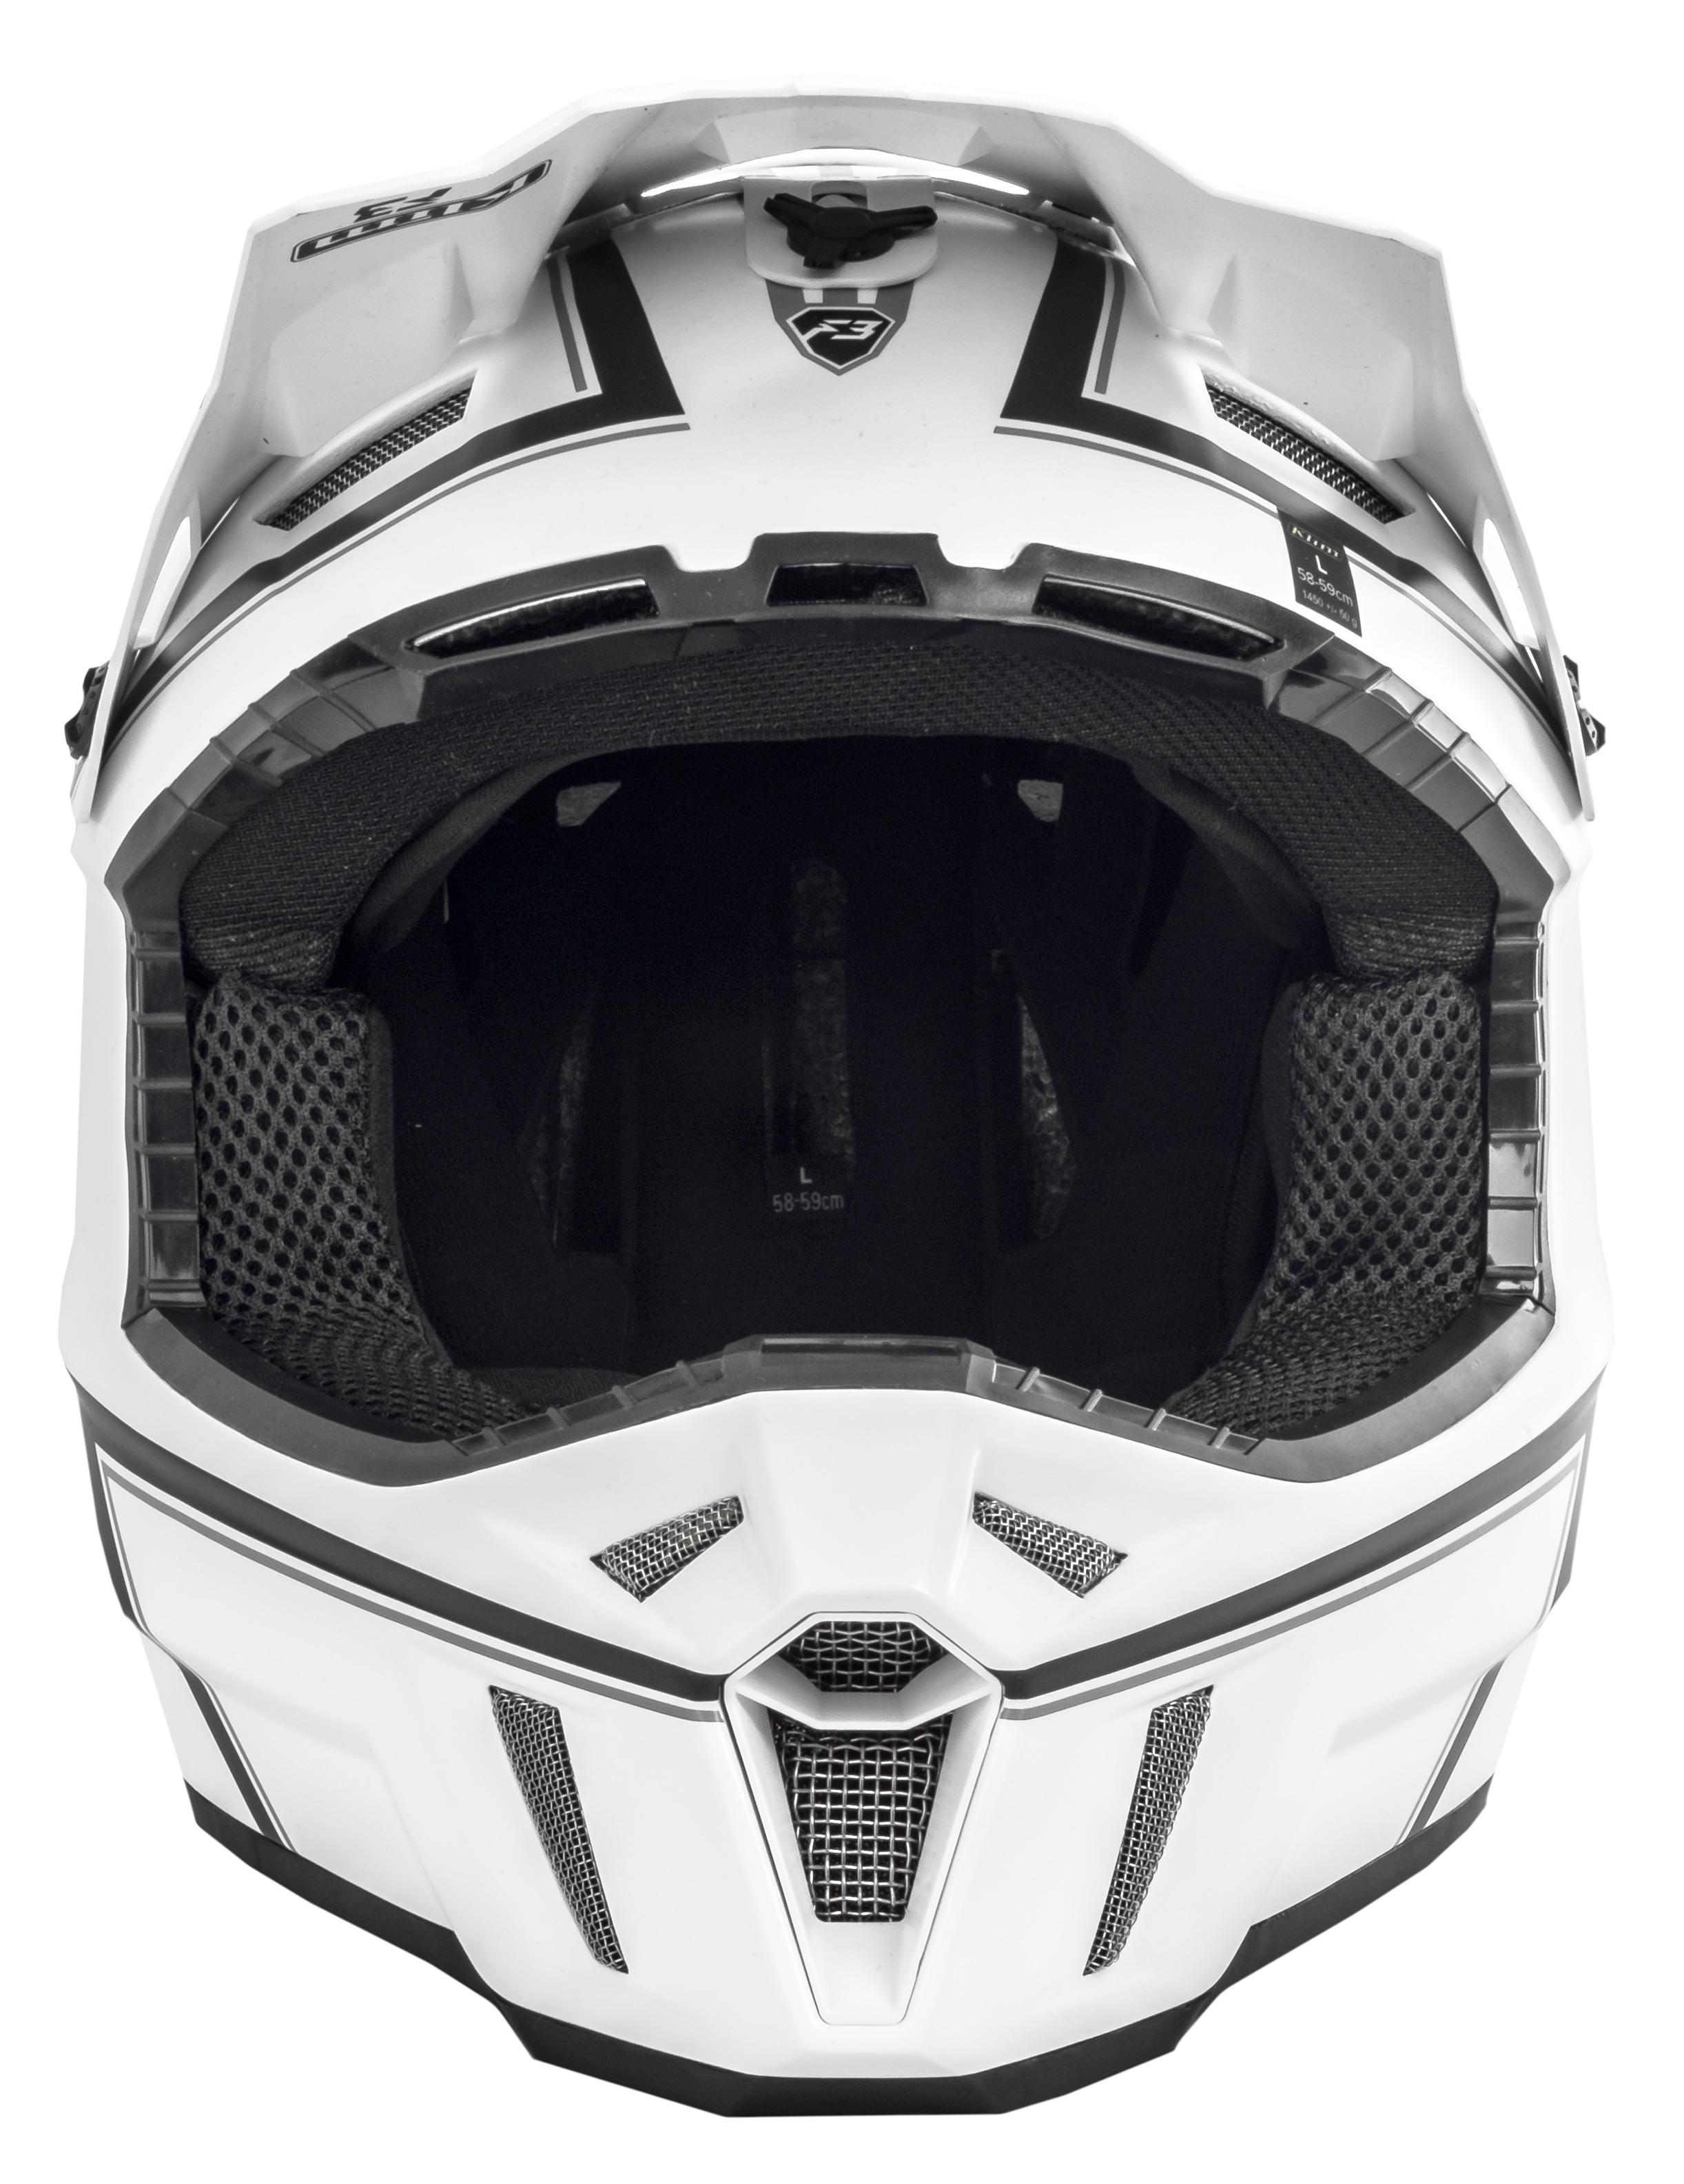 f3-helmet-3110-000_white-black-pinstripes_04